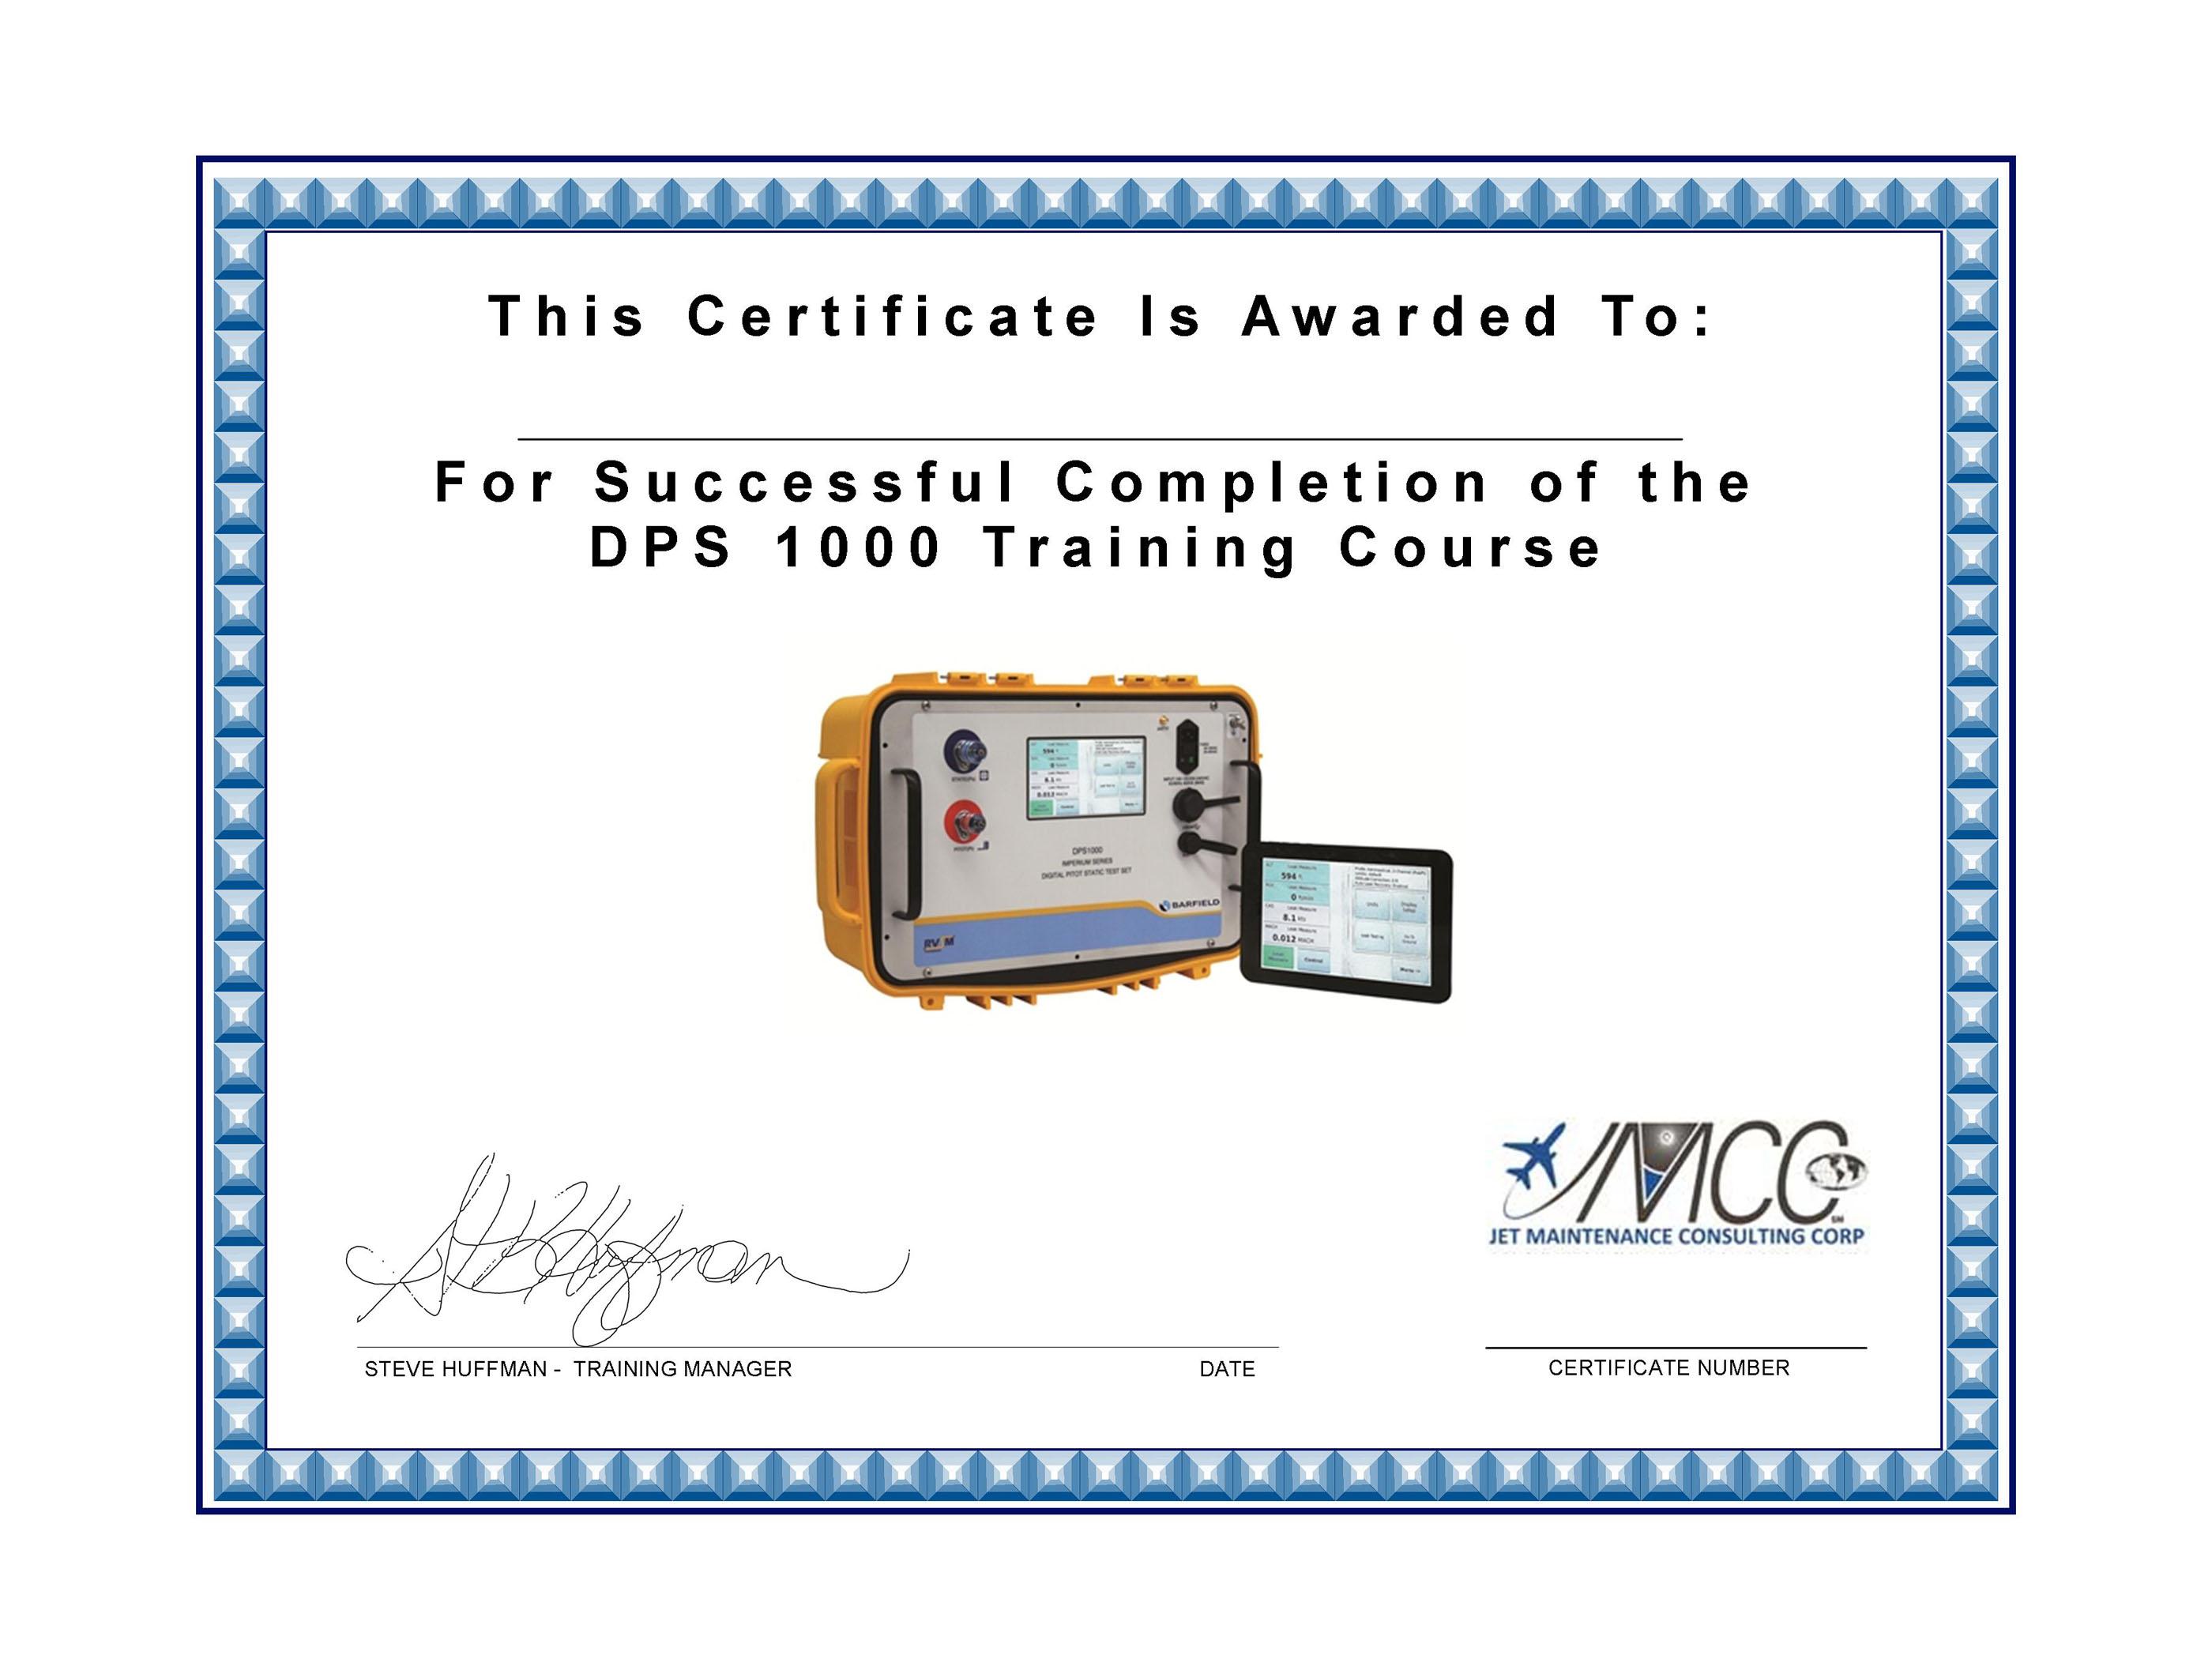 Jmcc dps 1000 pitot static tester operation dps 1000 pitot static tester operation xflitez Image collections